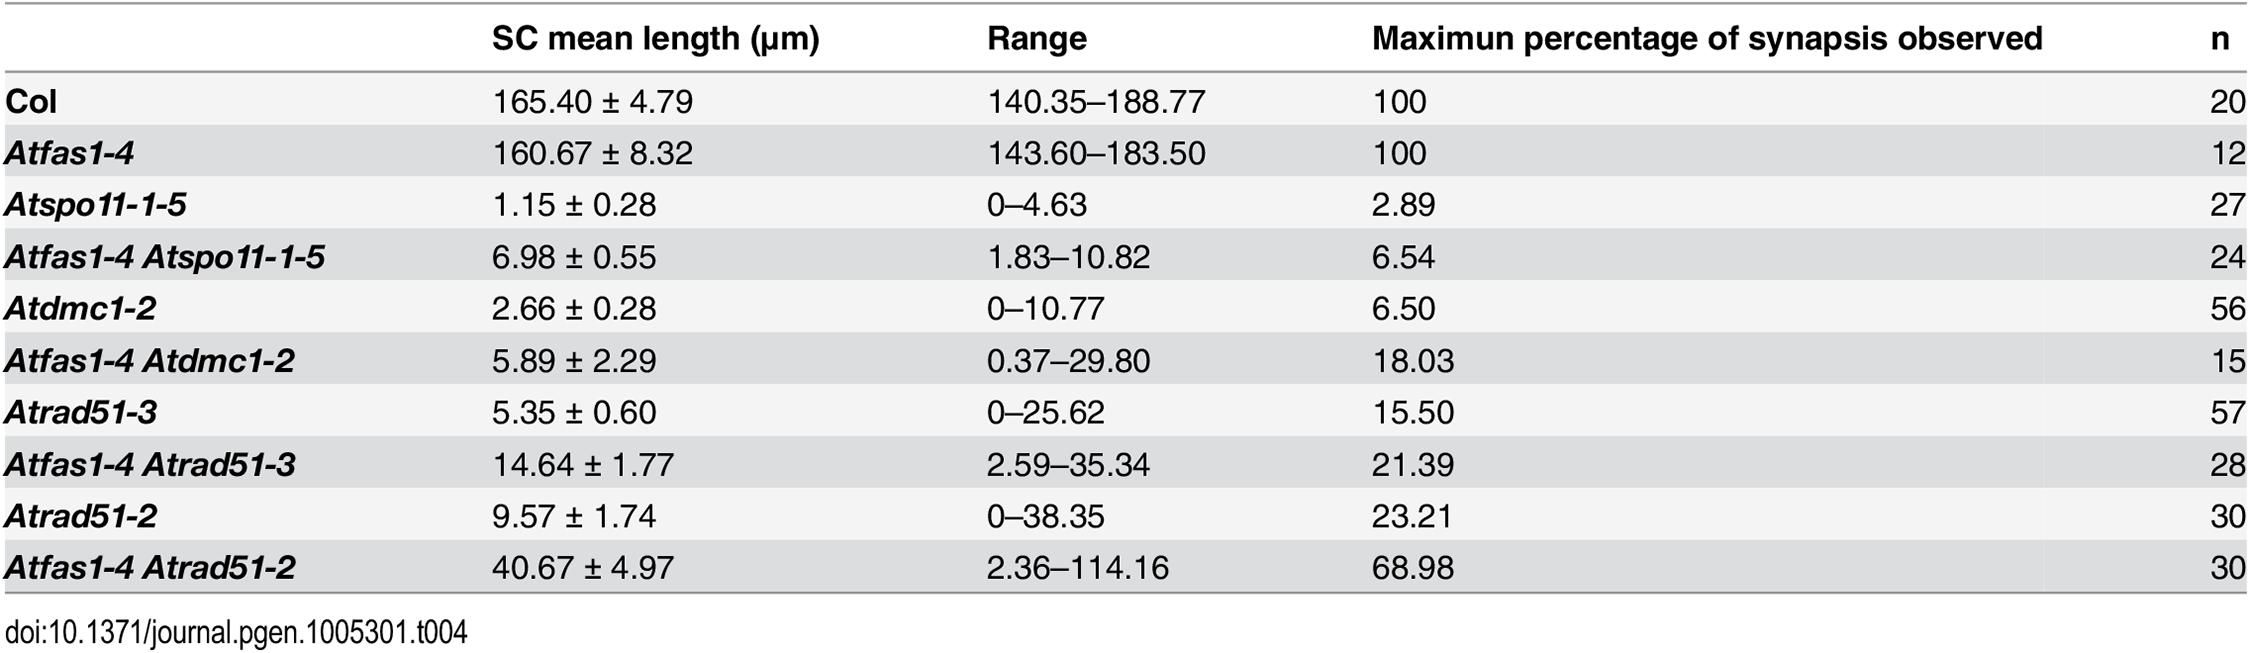 Comparison of SC lengths among different mutants.